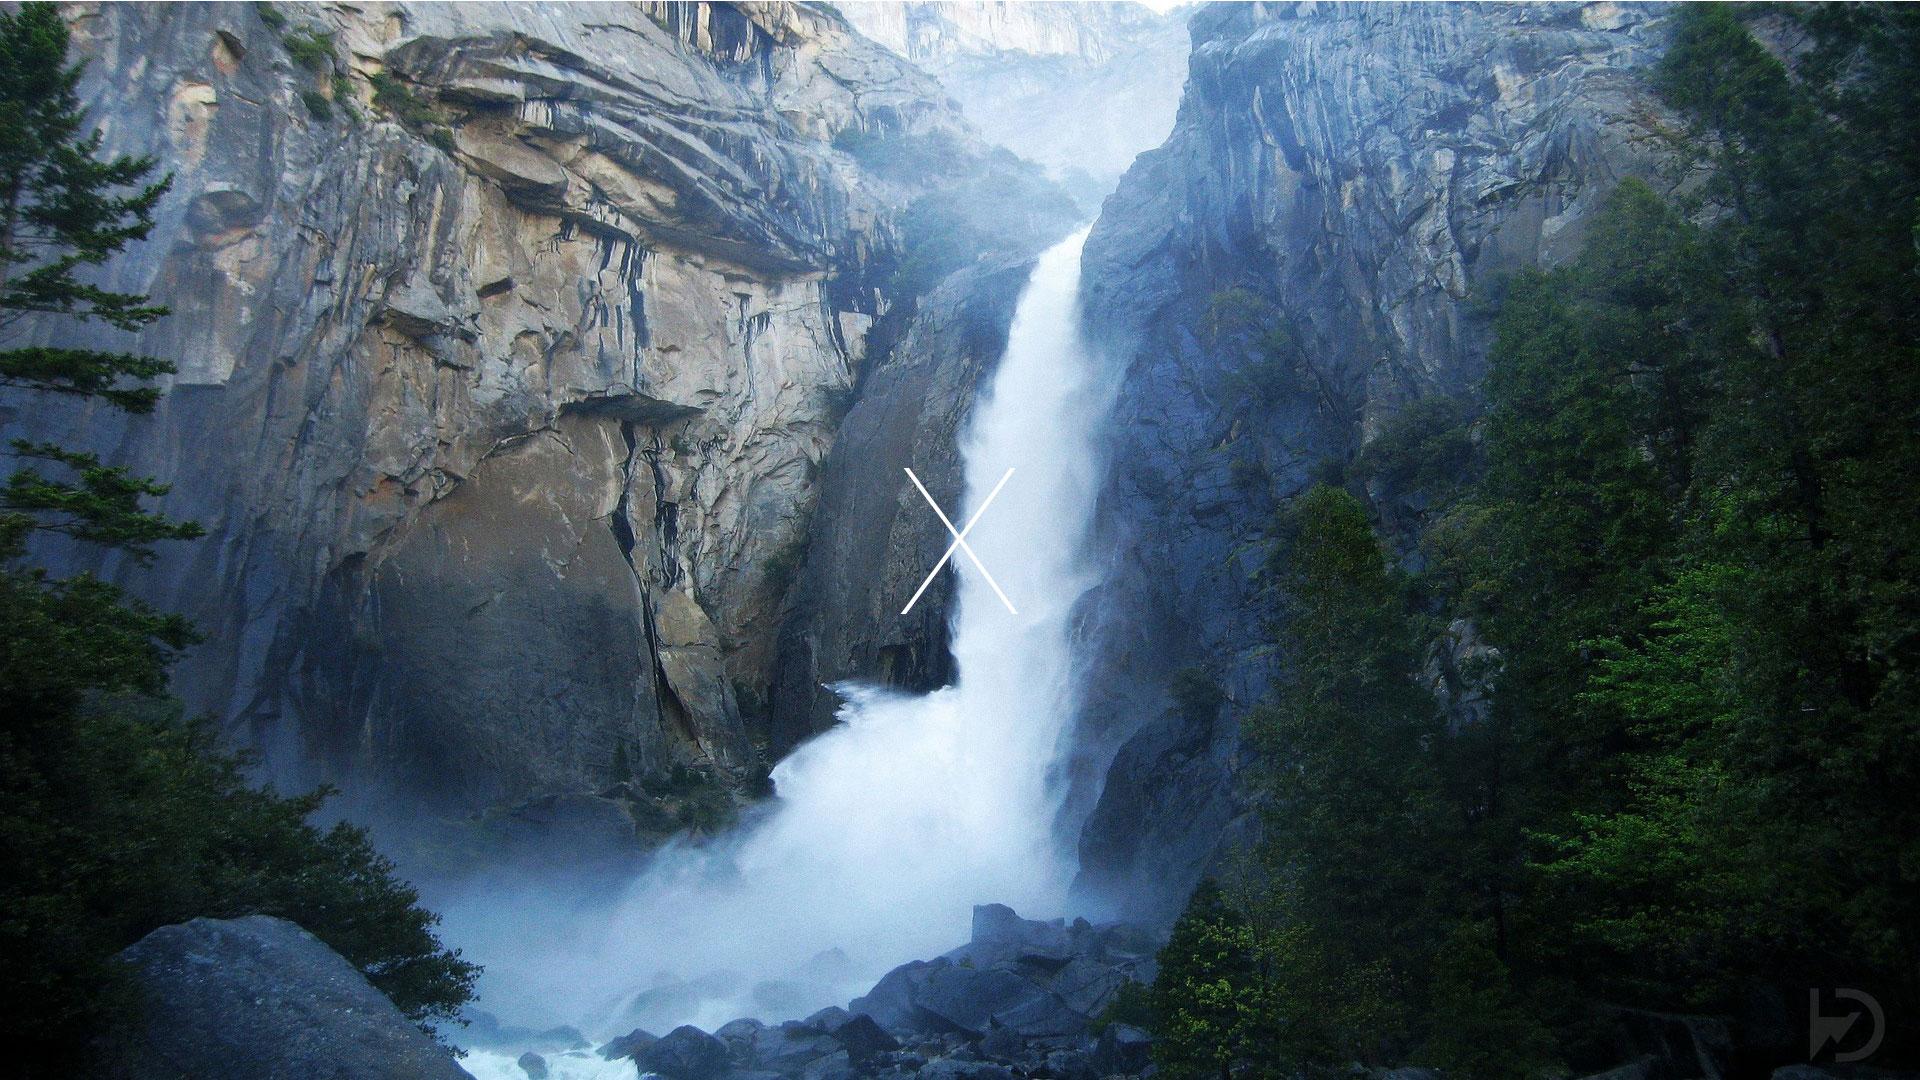 Iphone wallpaper os x yosemite - Official Os X Yosemite Hd Wallpapers Free Download